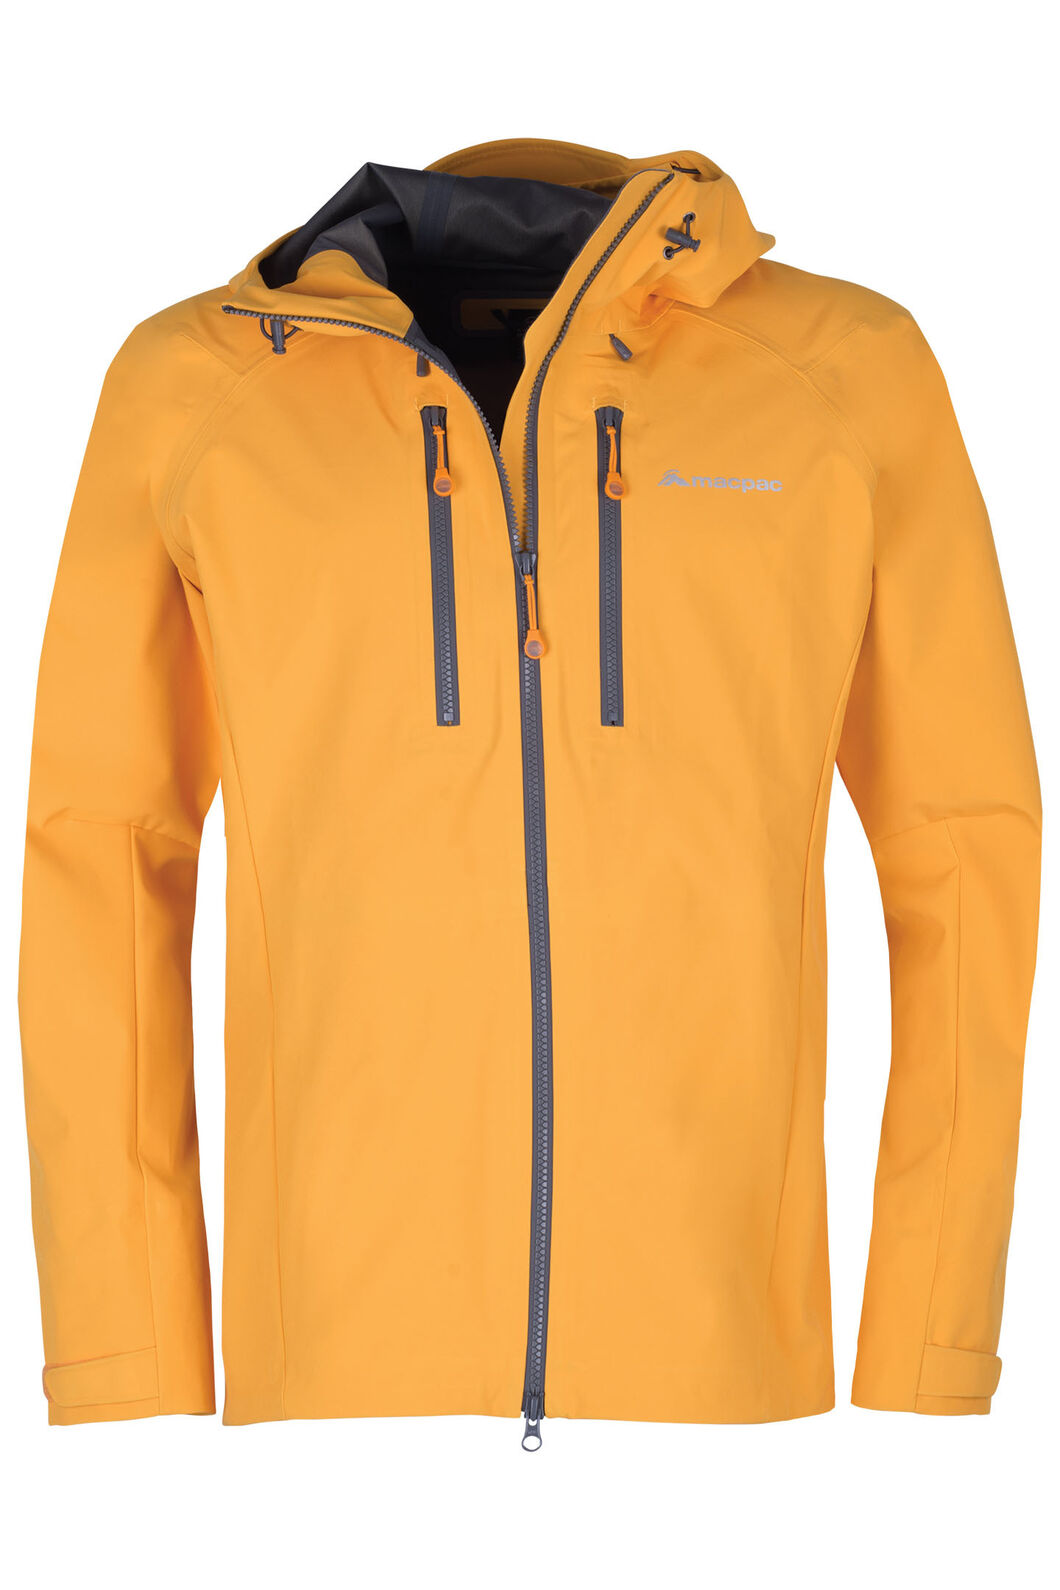 Macpac Fitzroy Alpine Series Softshell Jacket - Men's, Zinnia, hi-res